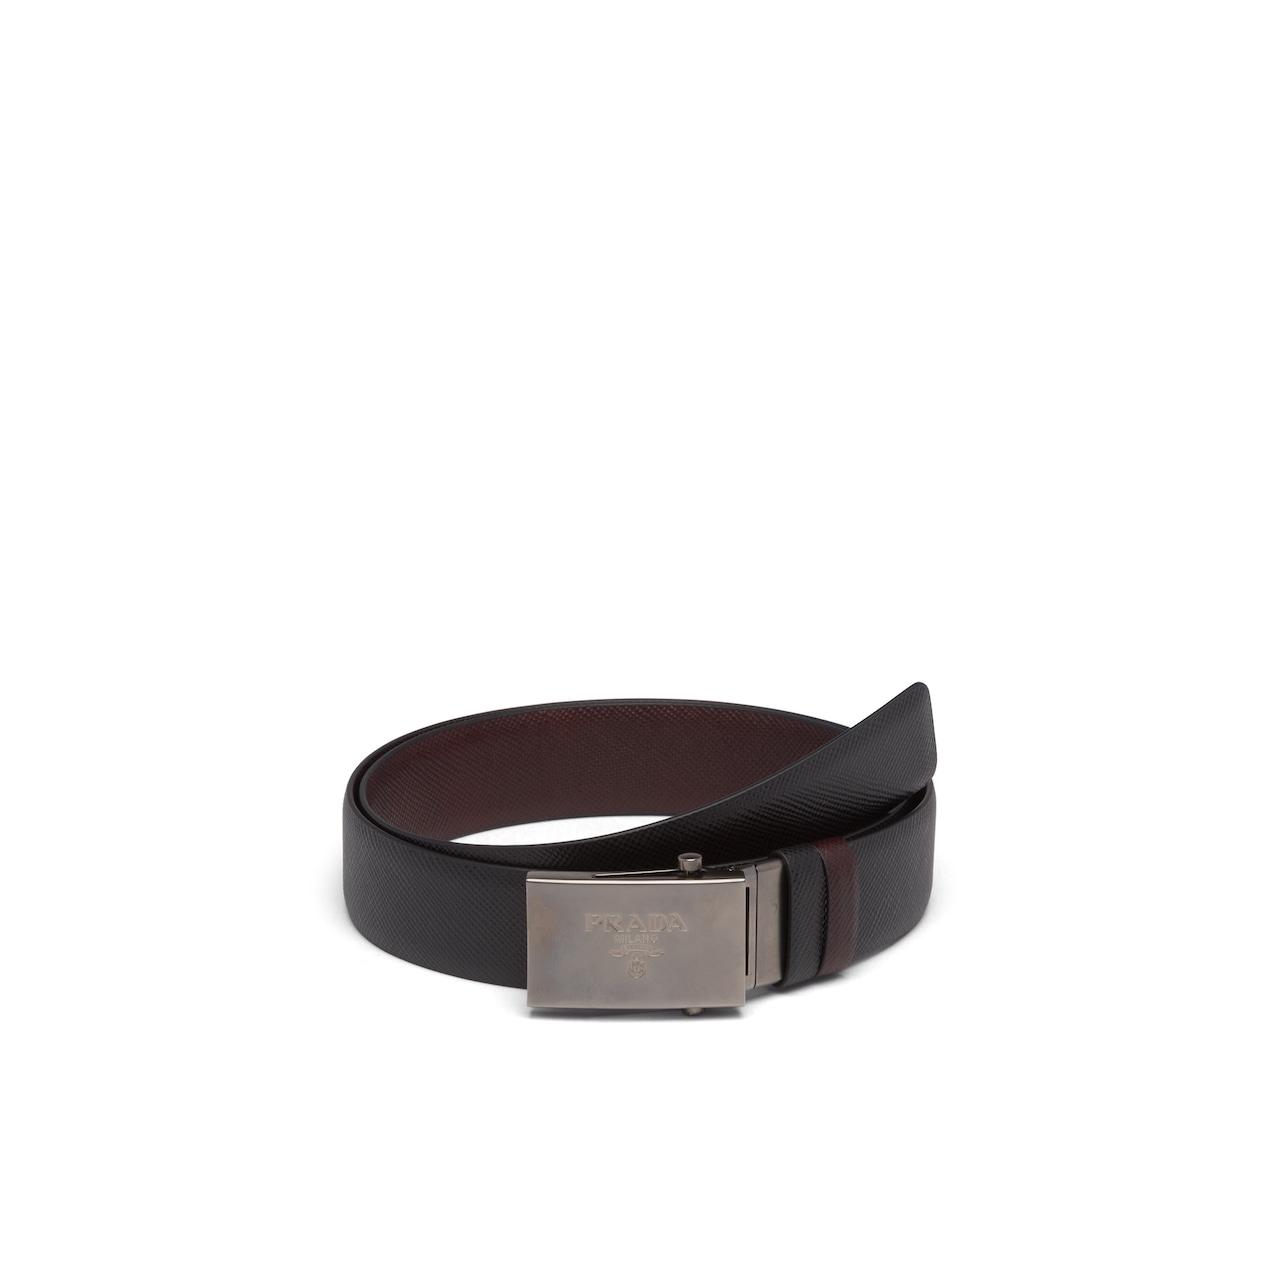 Prada Saffiano Leather Reversible Belt 1